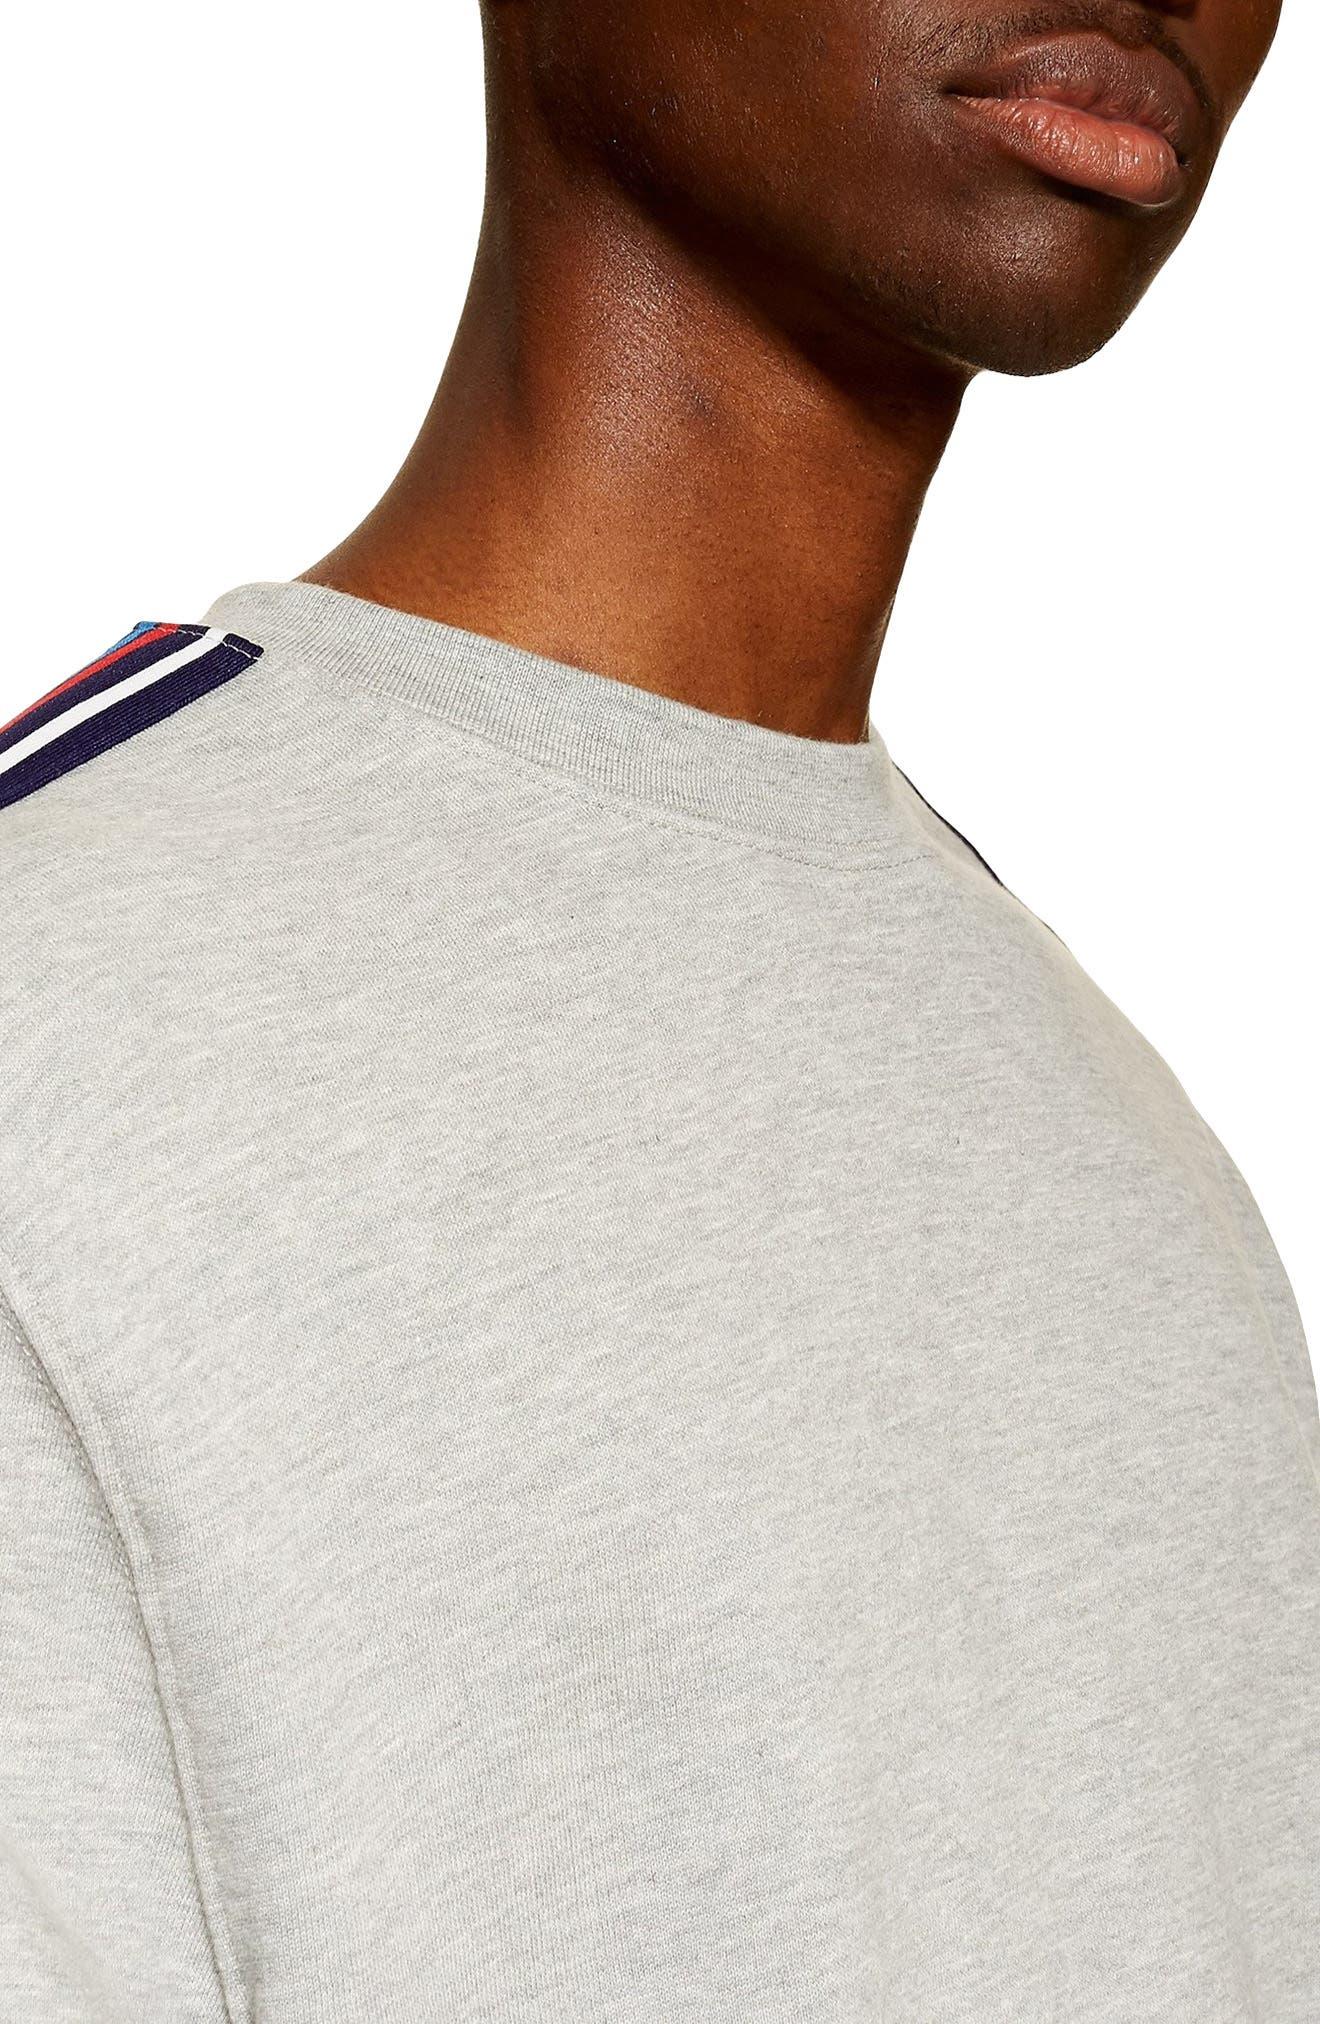 TOPMAN, Tape Crewneck Sweatshirt, Alternate thumbnail 3, color, LIGHT GREY